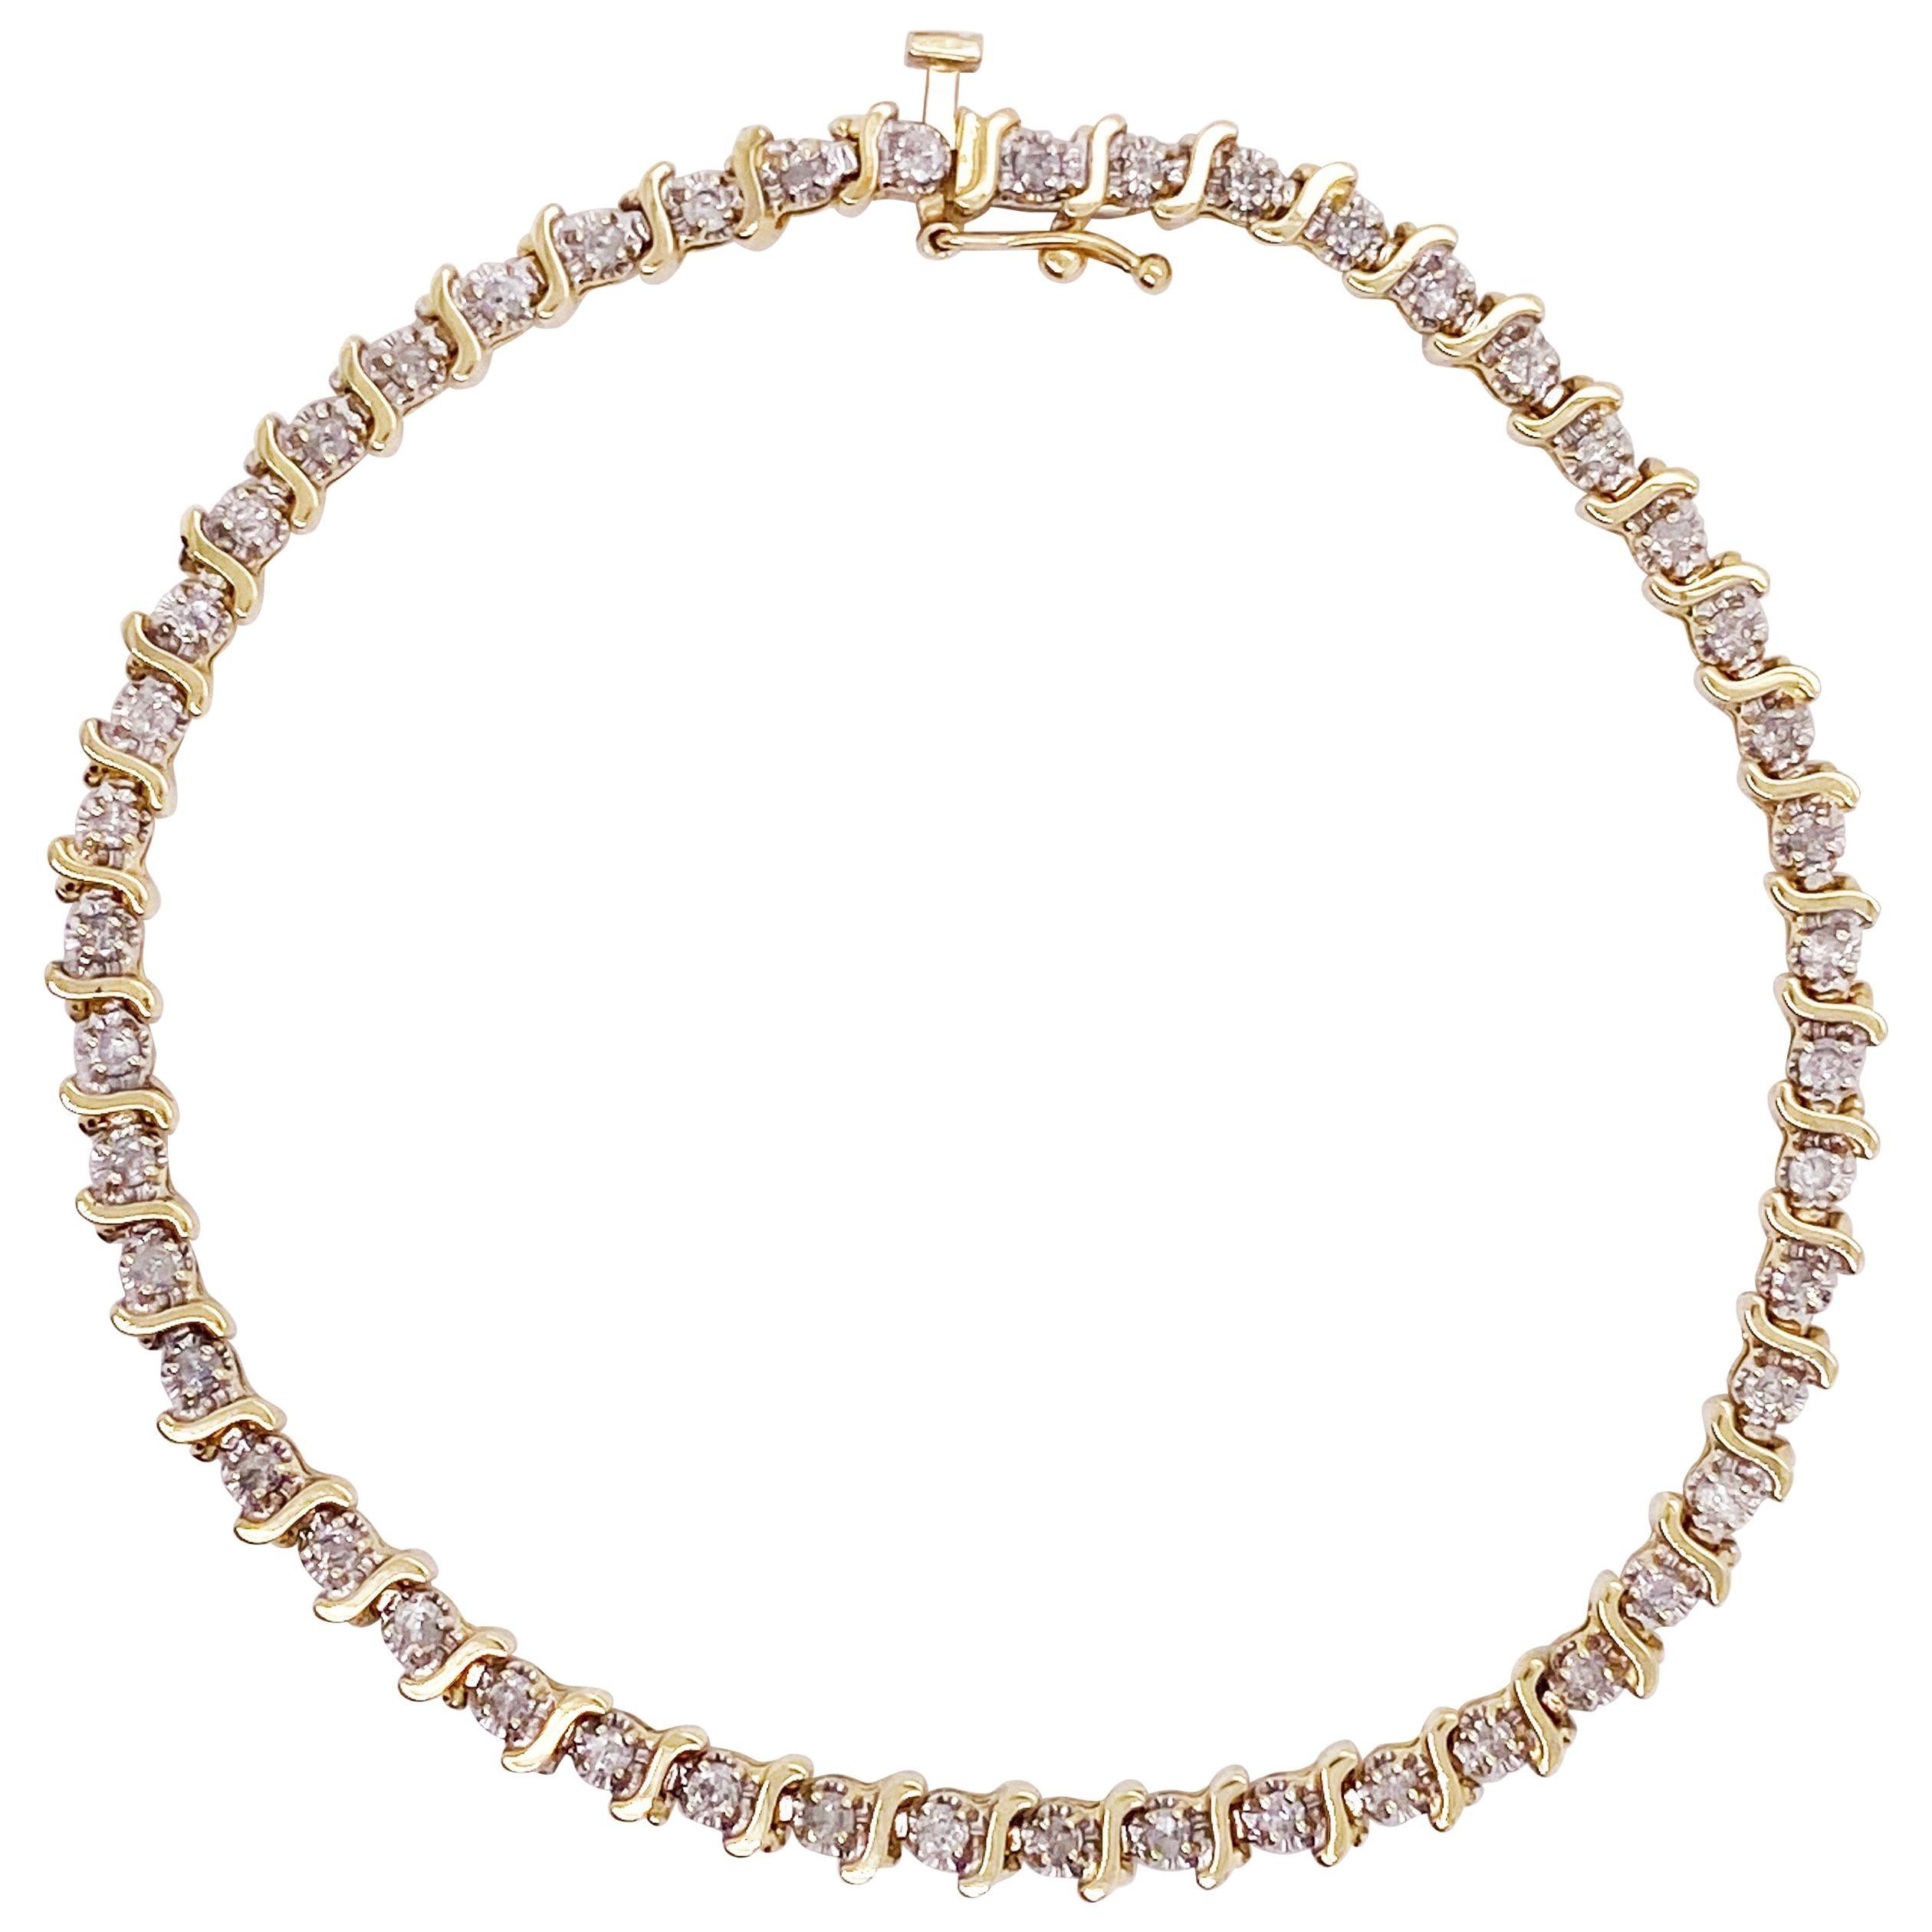 Half Carat Diamond Tennis Bracelet .50 Carat Round Diamond Bracelet 14K Gold